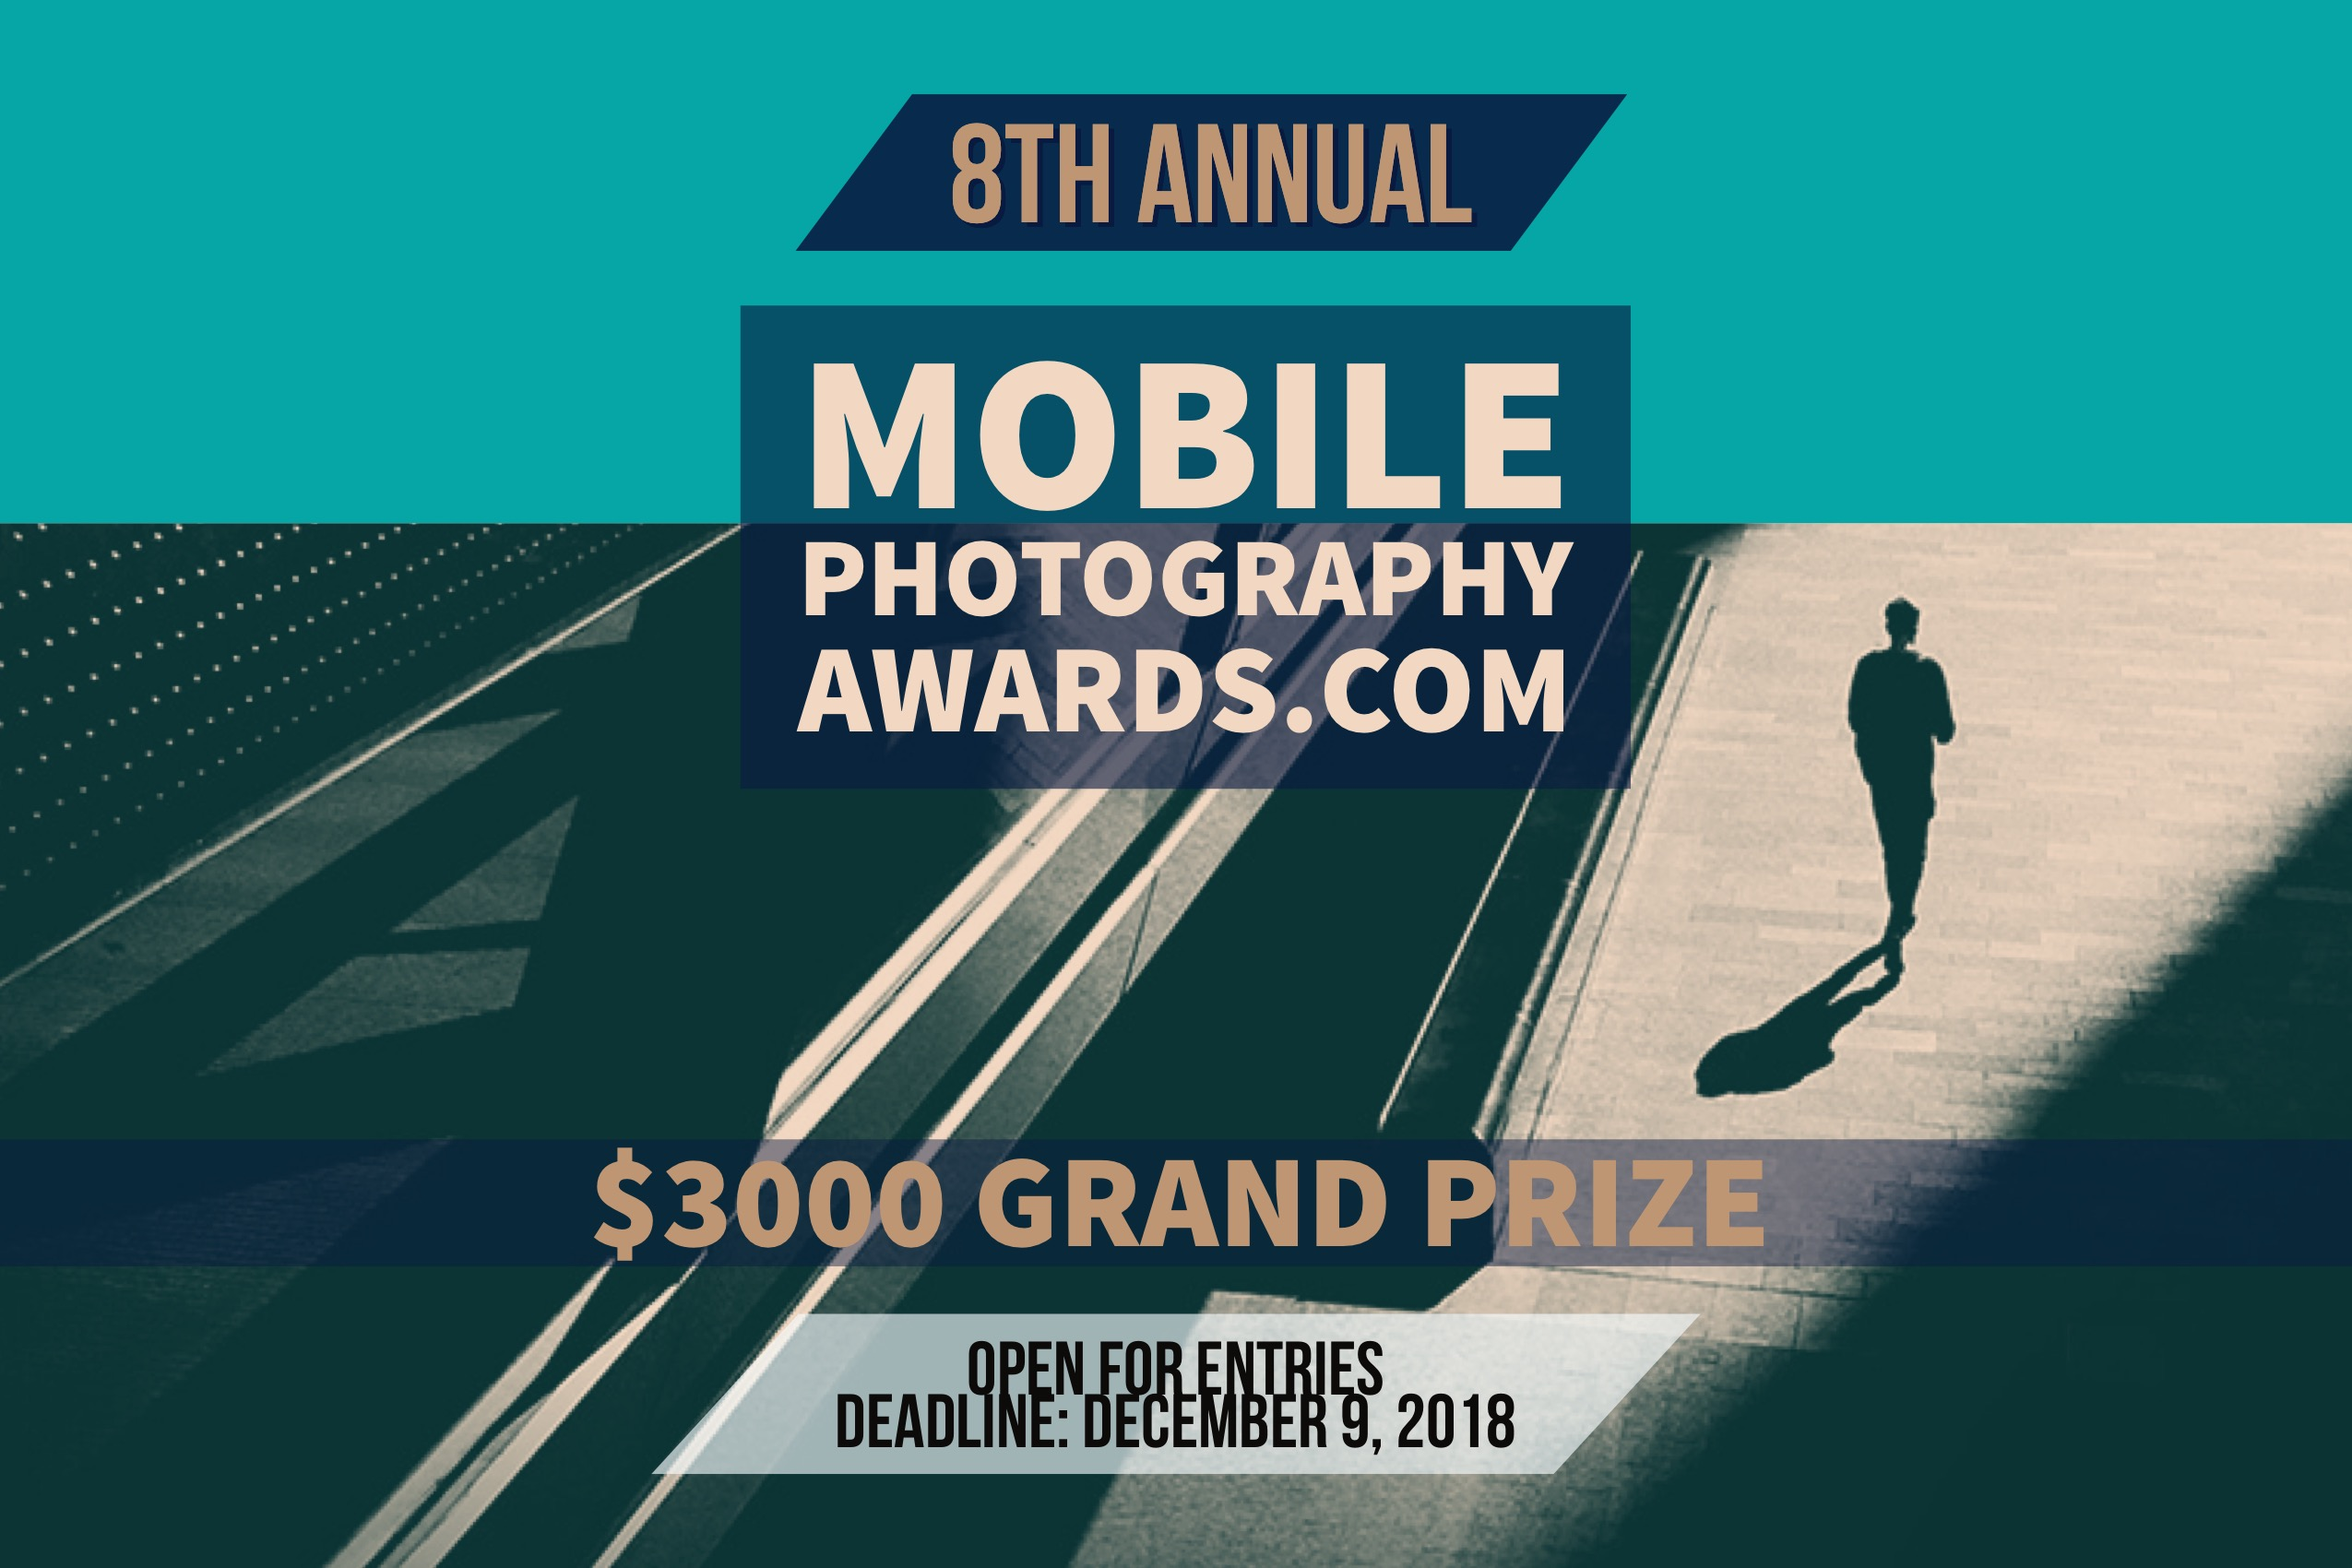 Mobile Photography Awards - Mobile Photography Awards